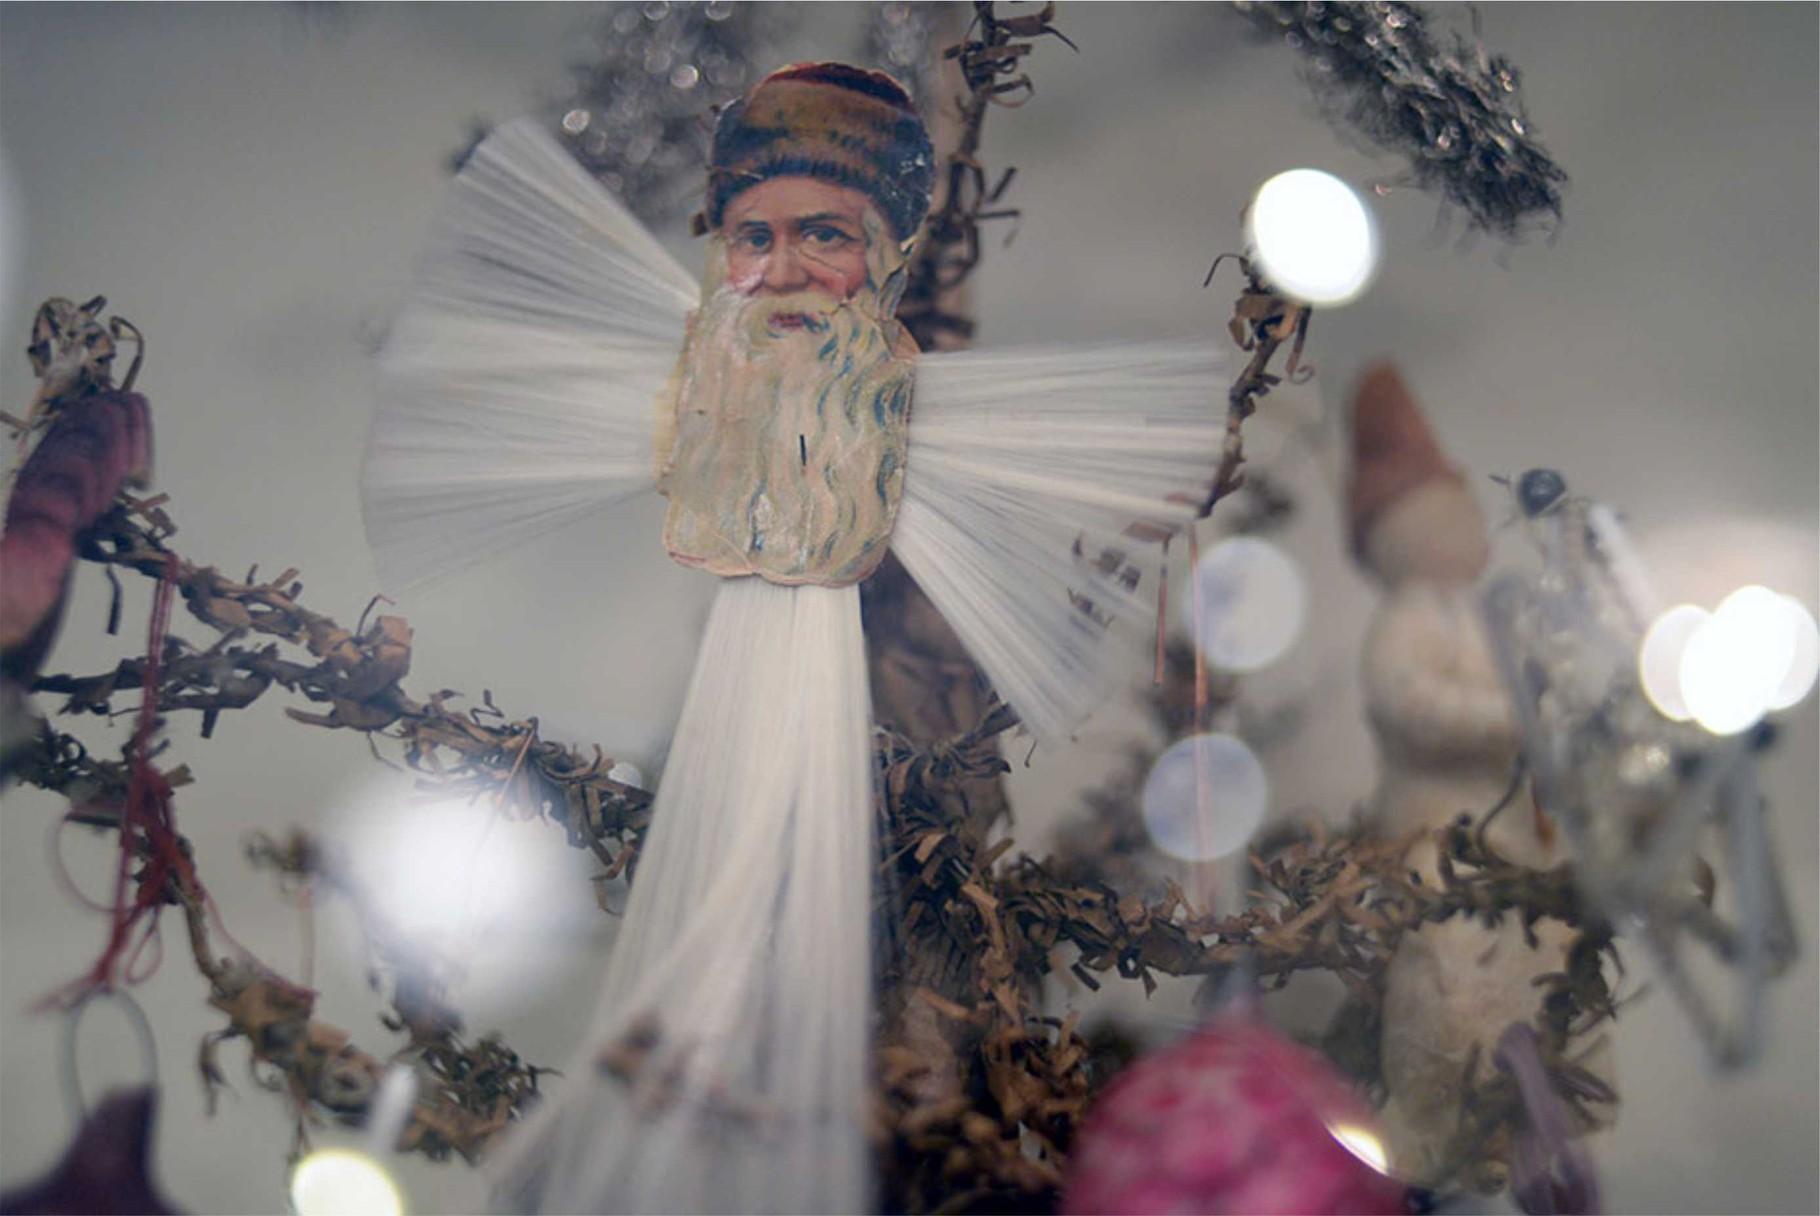 Рождественский дед Мороз. Хромолитография. Конец XIX -начало XX вв.